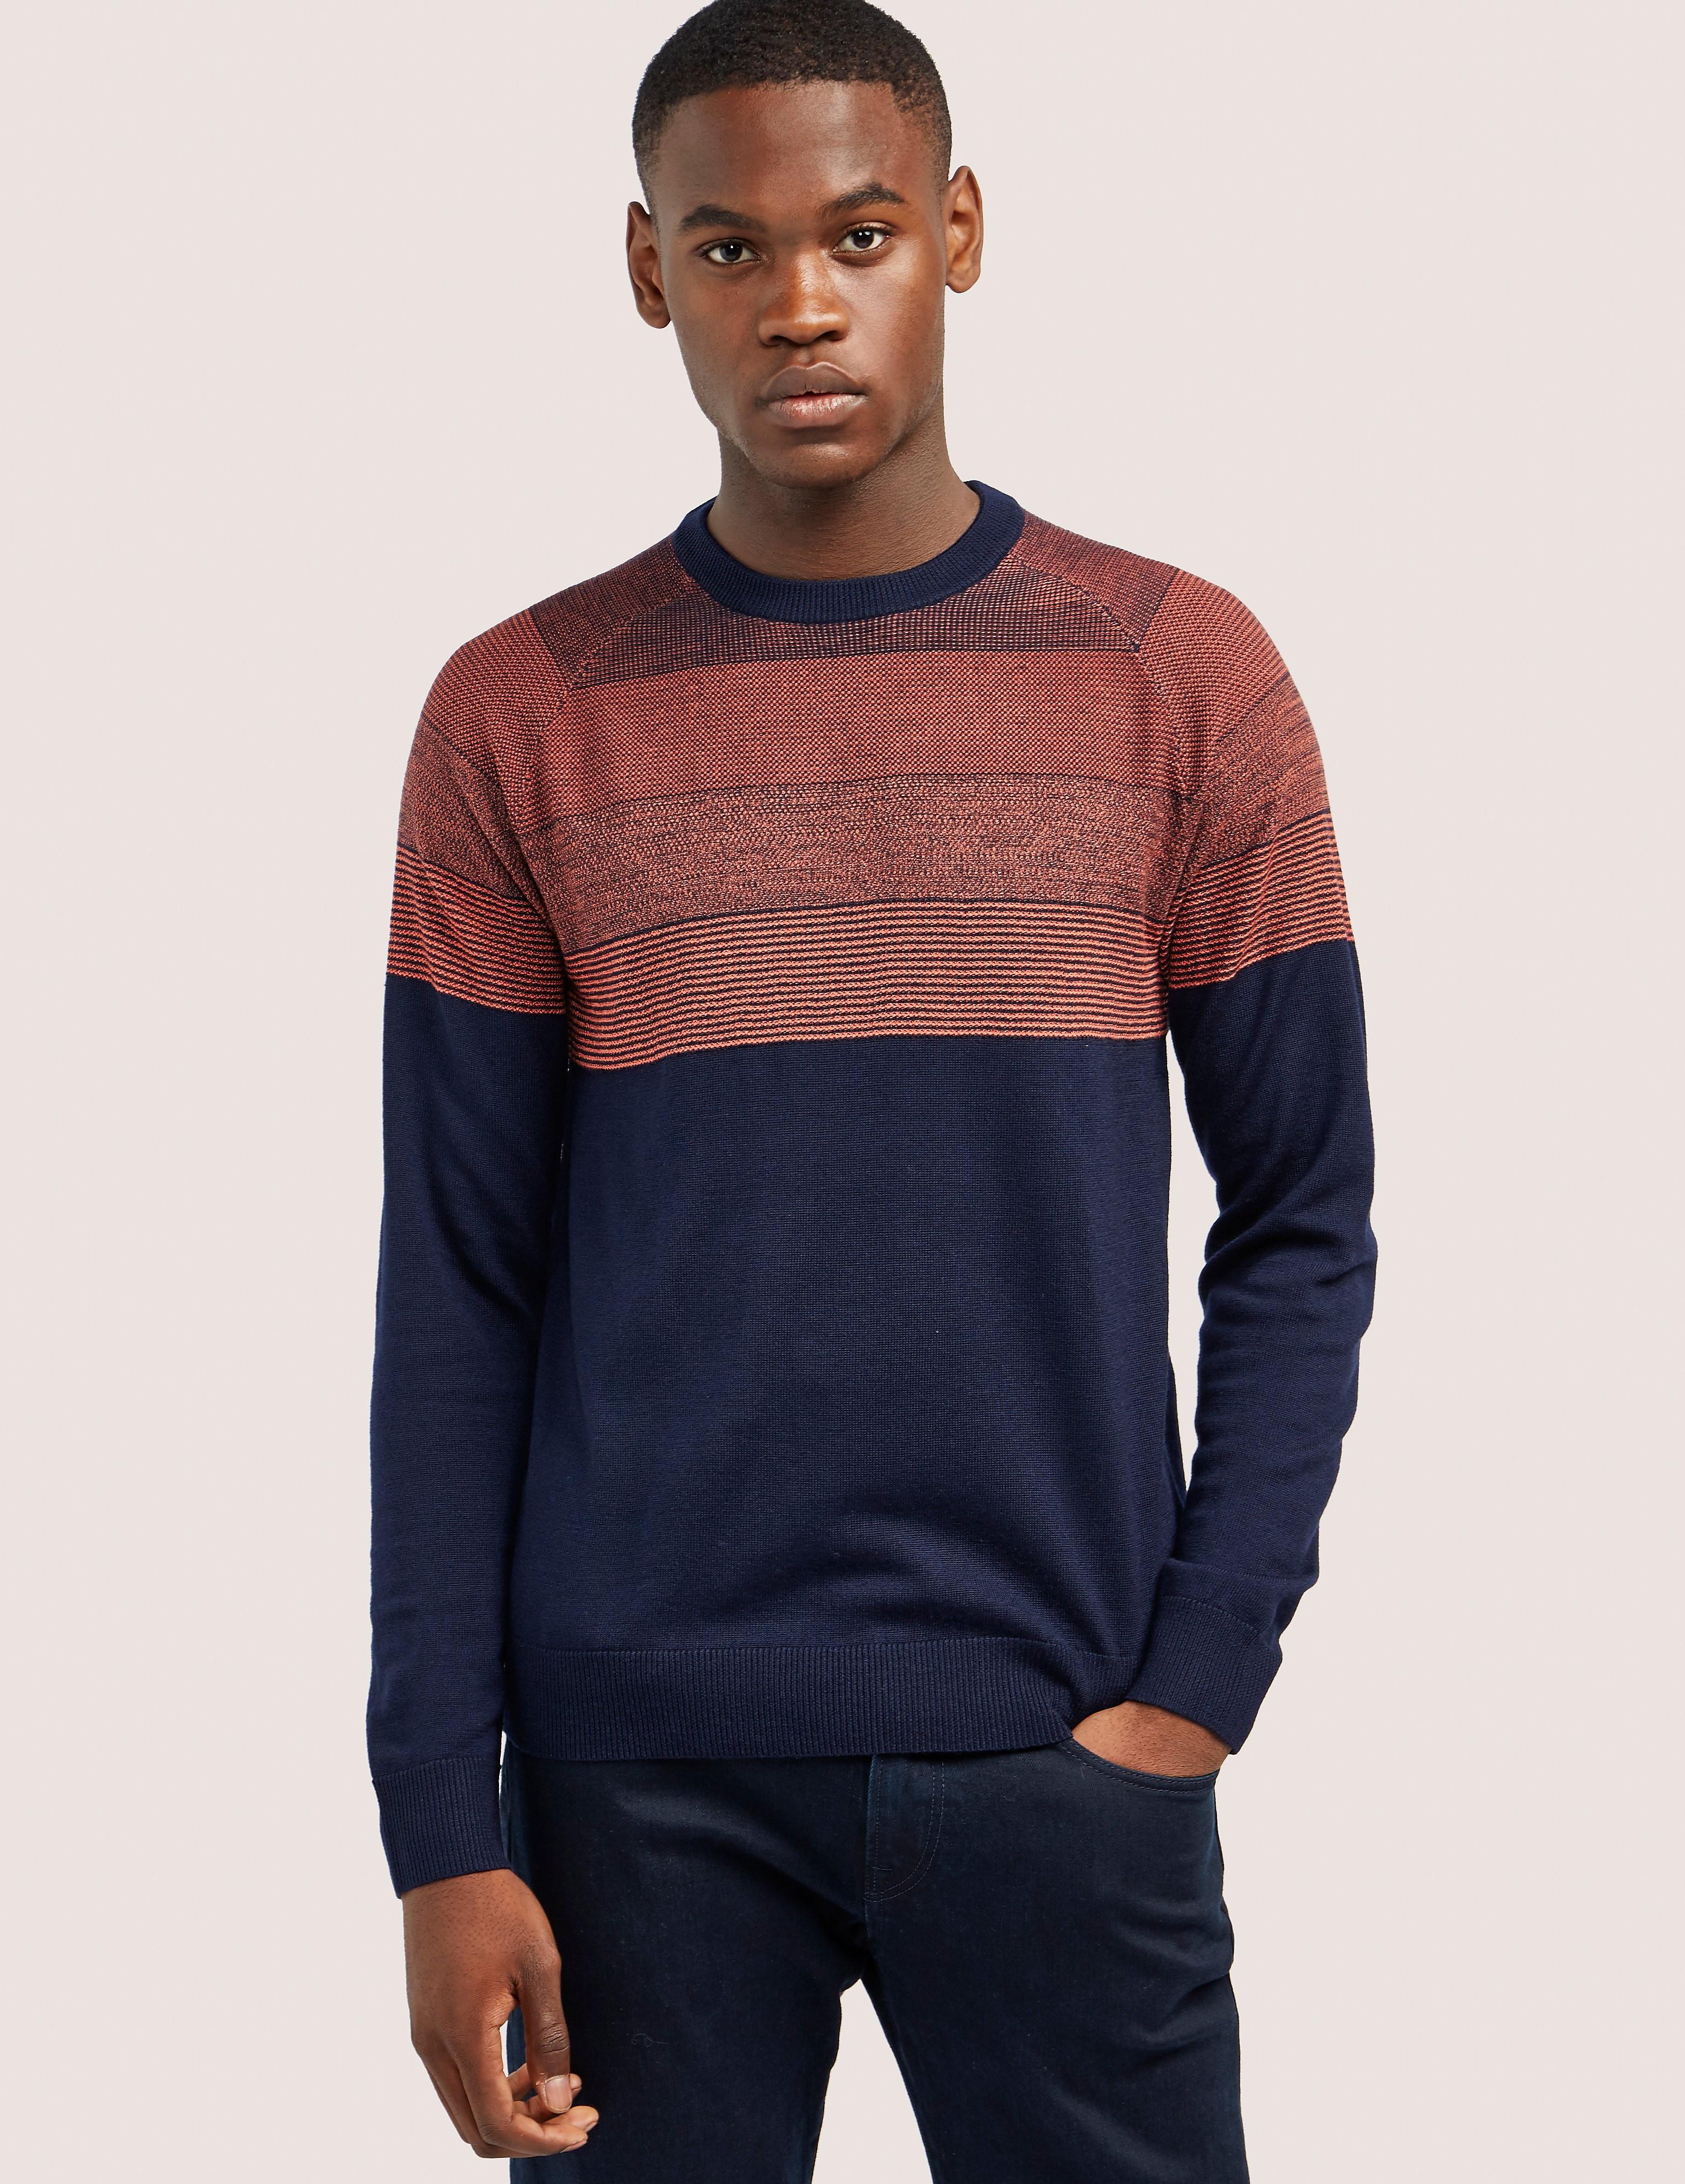 Paul Smith Contrast Long Sleeve Knit